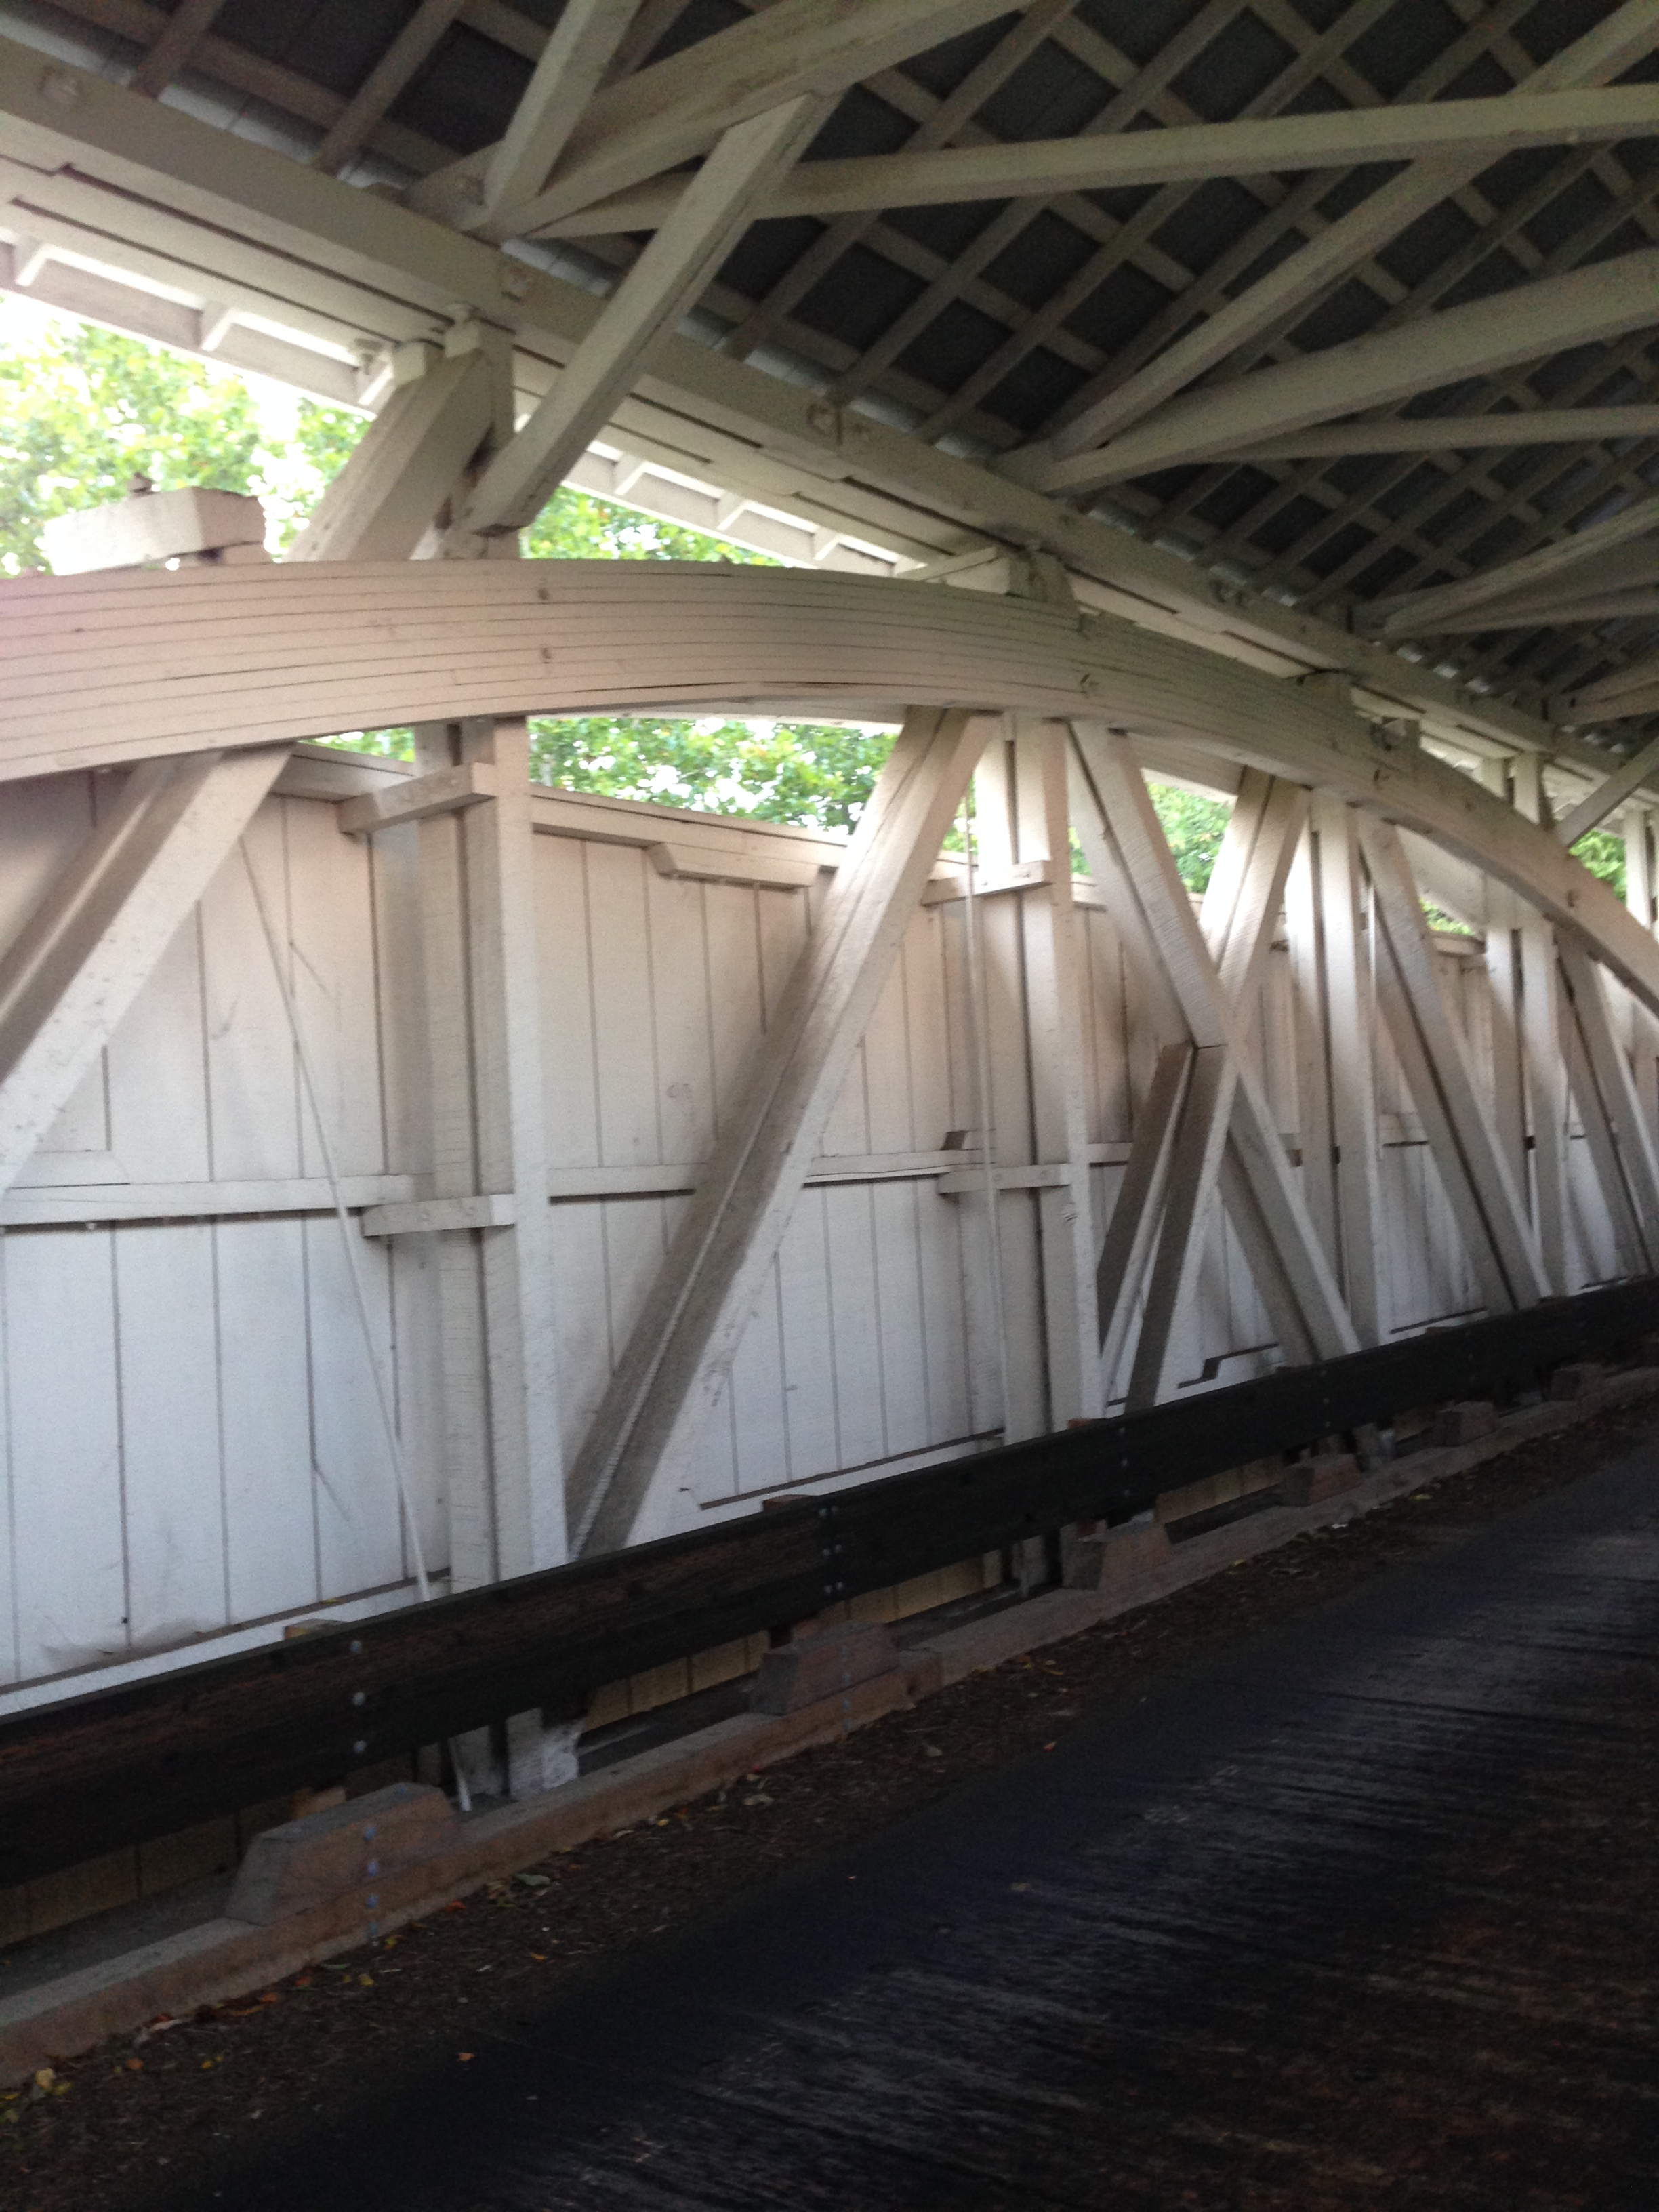 Arch Trusses on the Harshaville Bridge